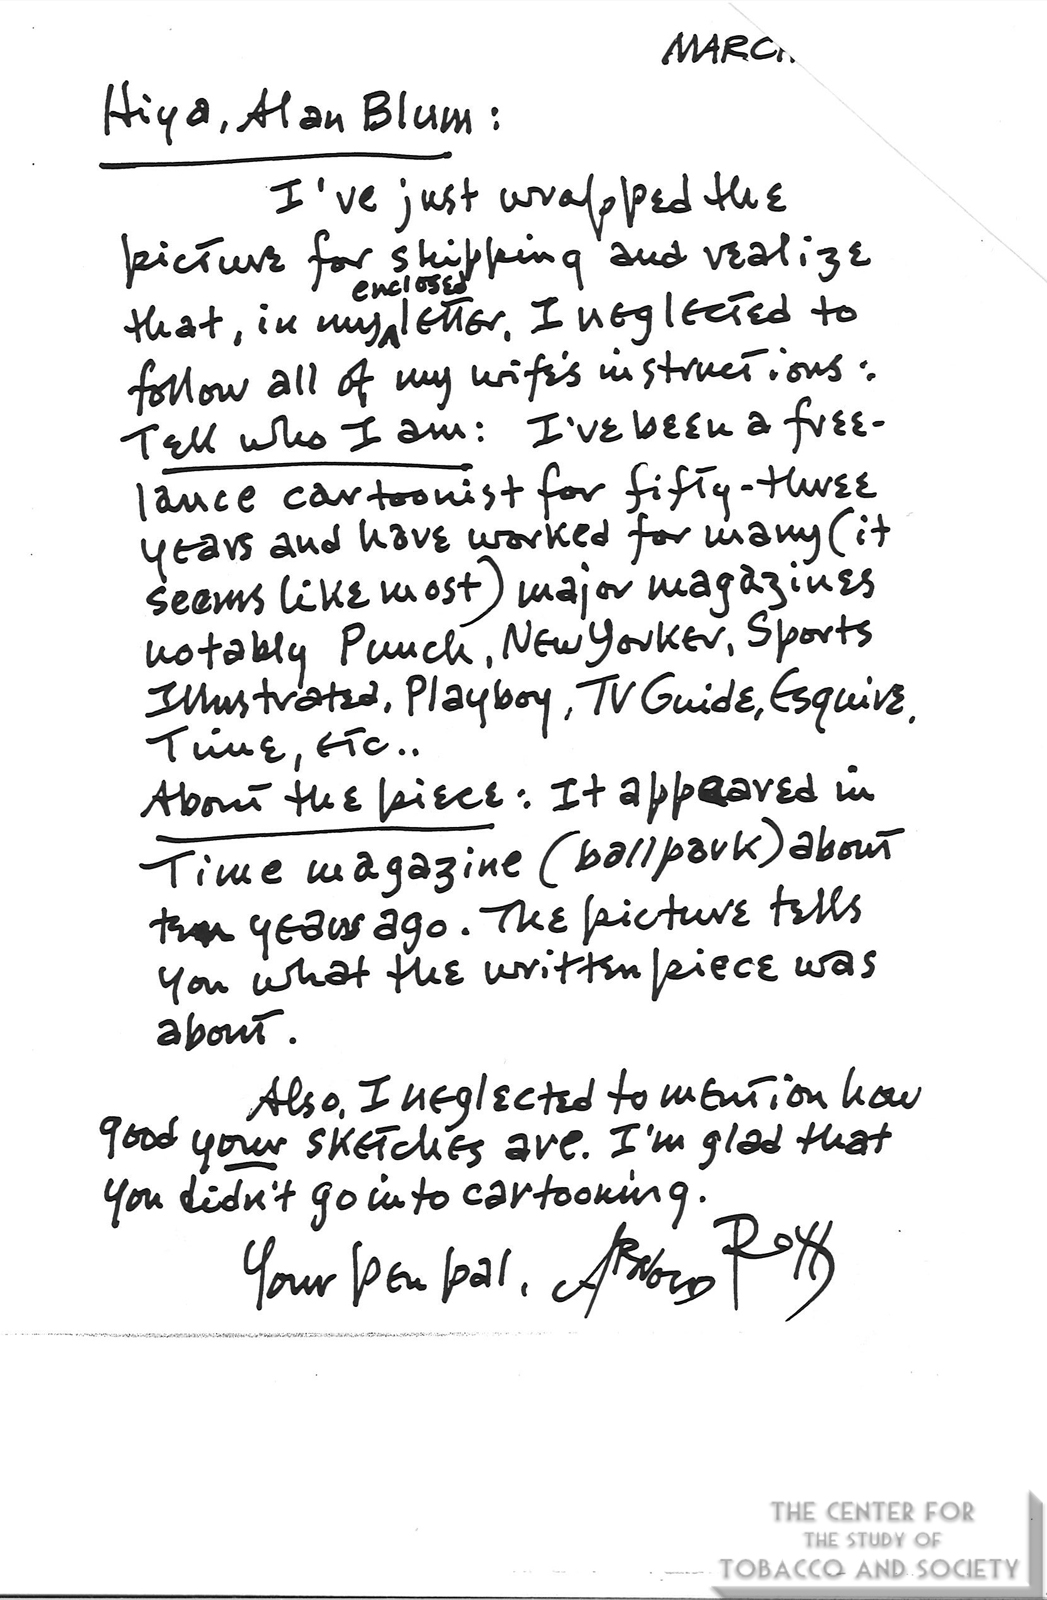 2004 03 Arnold Roth to Alan Blum